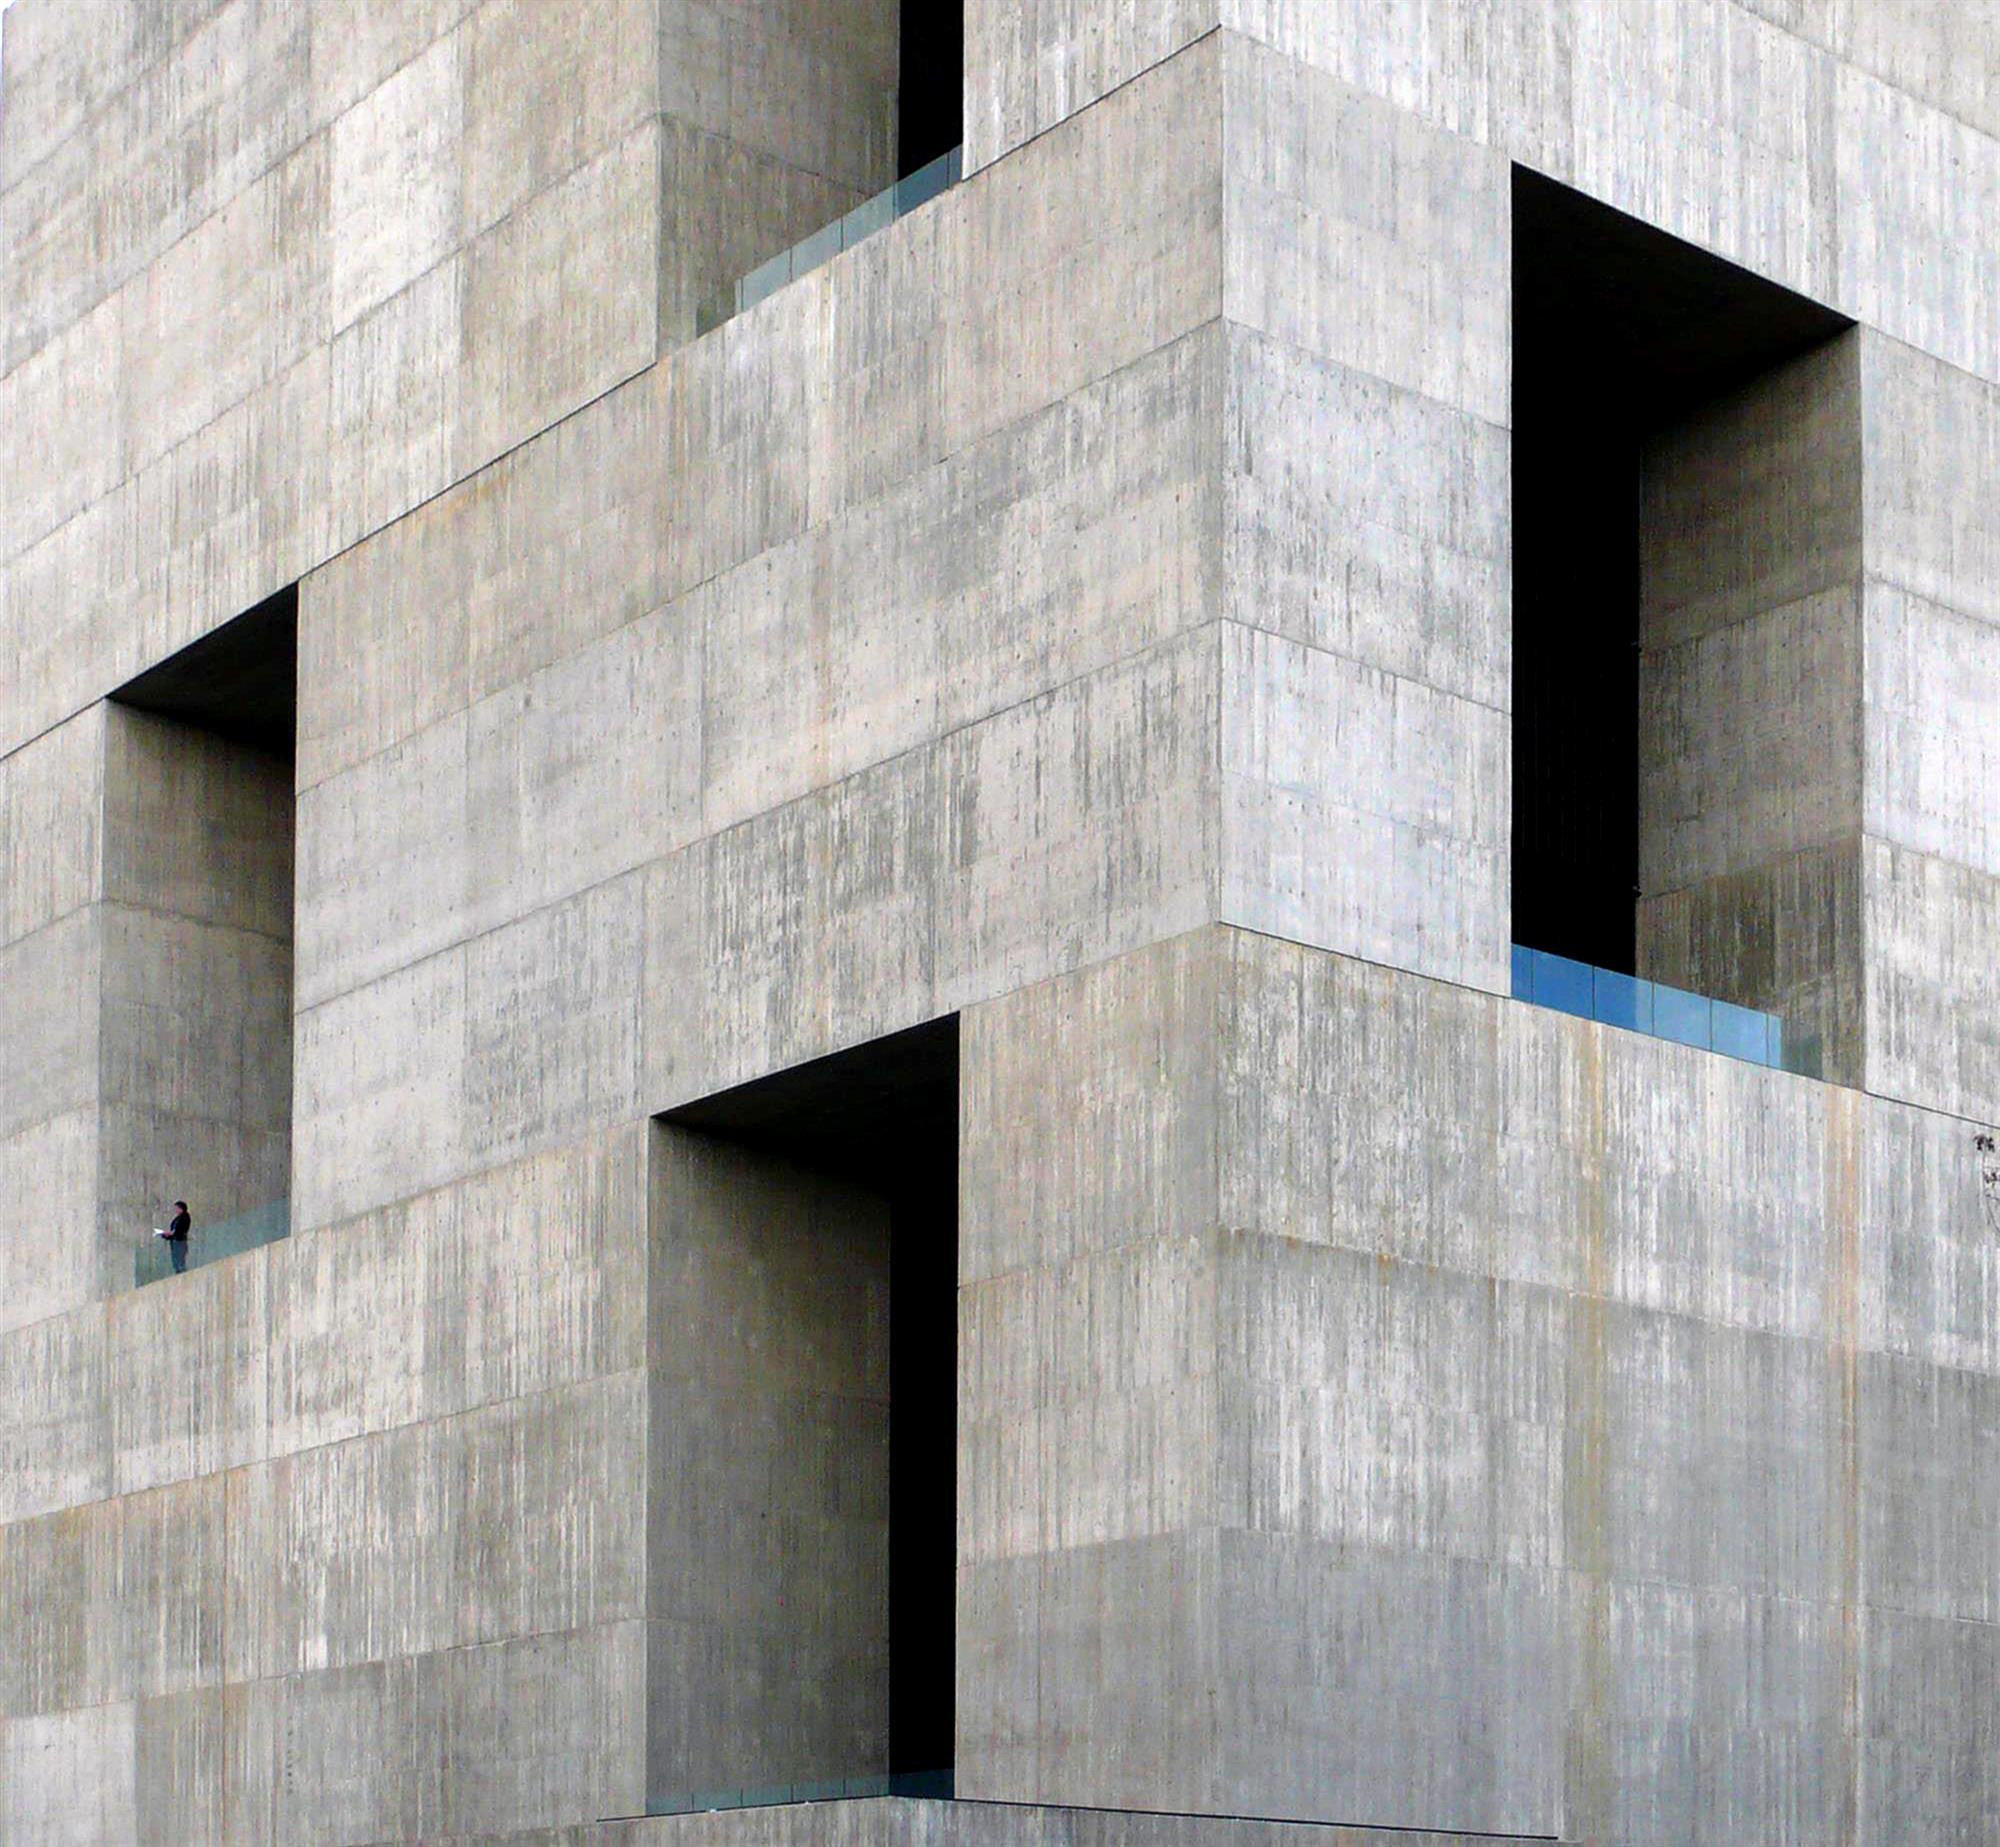 Alejandro aravena s uc innovation centre wins 2015 design - Alejandro aravena arquitecto ...